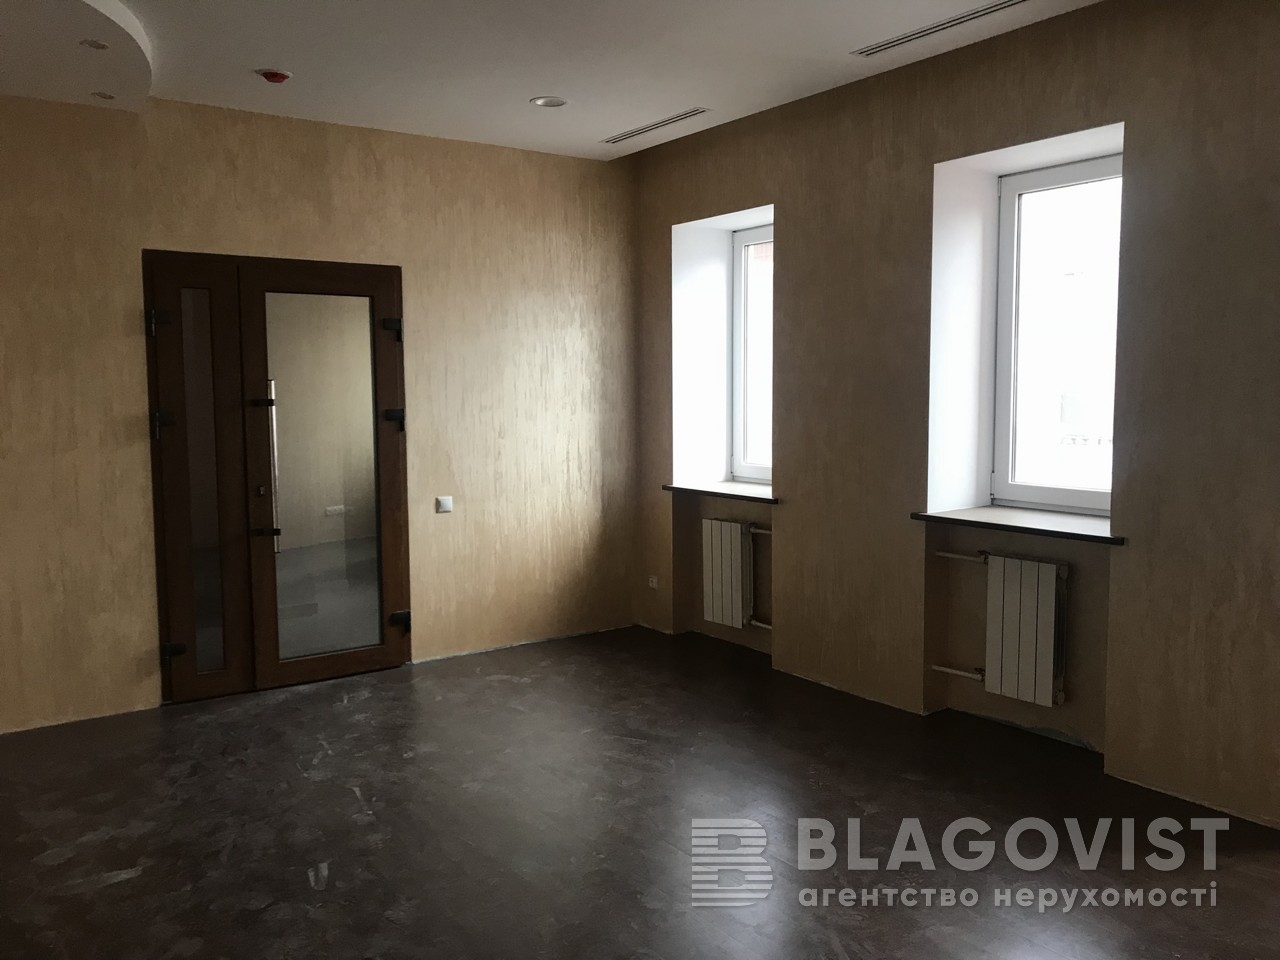 Дом, H-41424, Борисоглебская, Киев - Фото 13